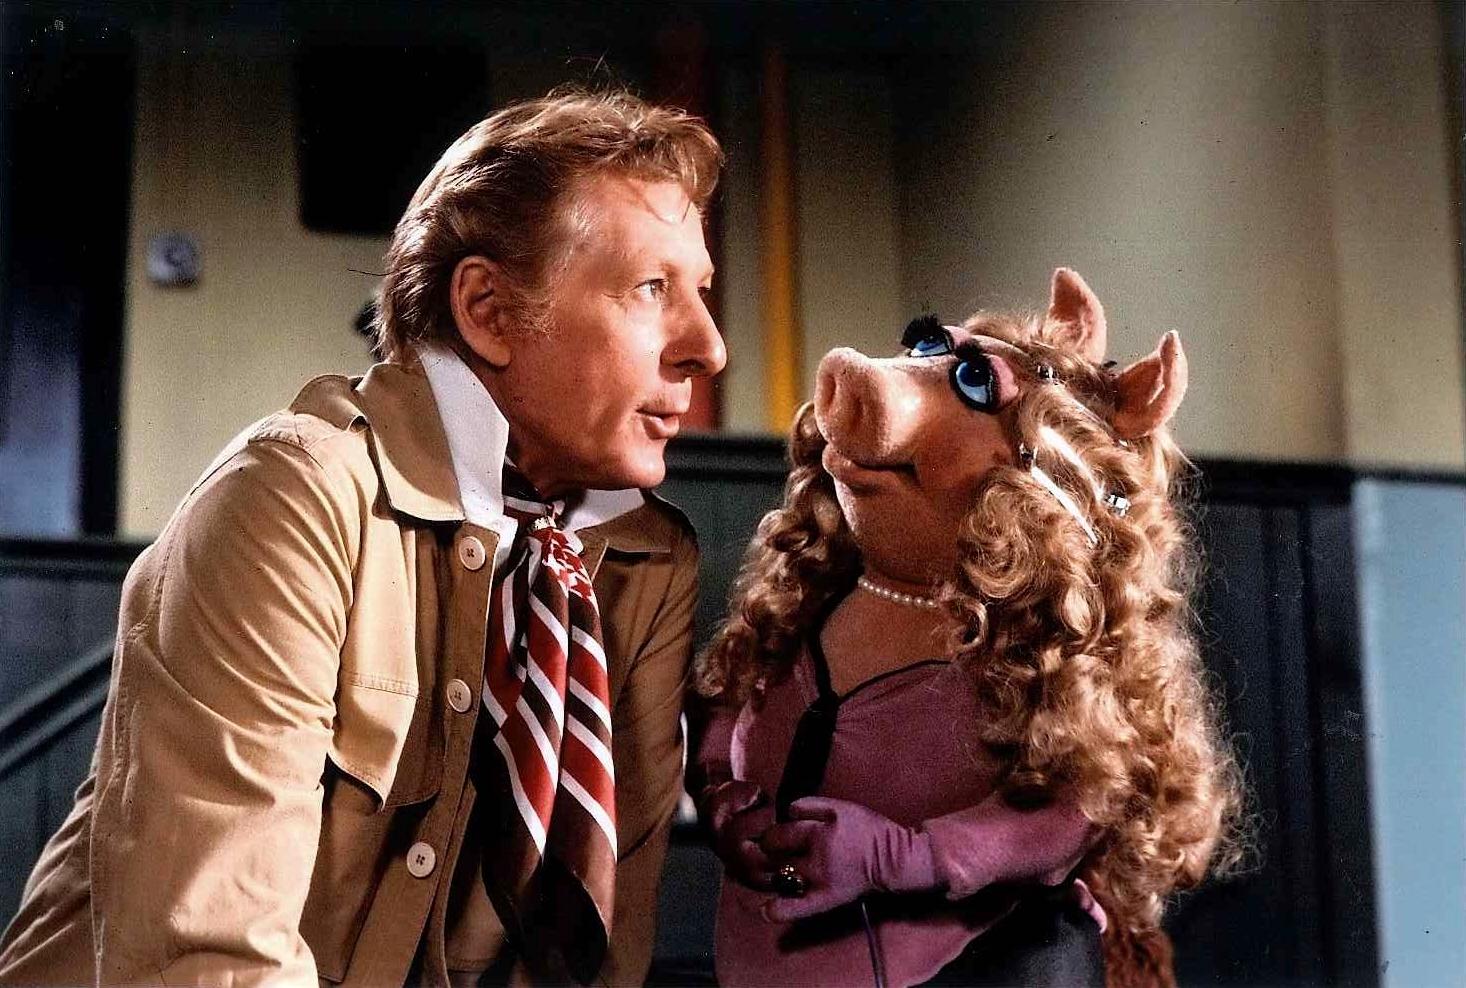 Episode 316: Danny Kaye